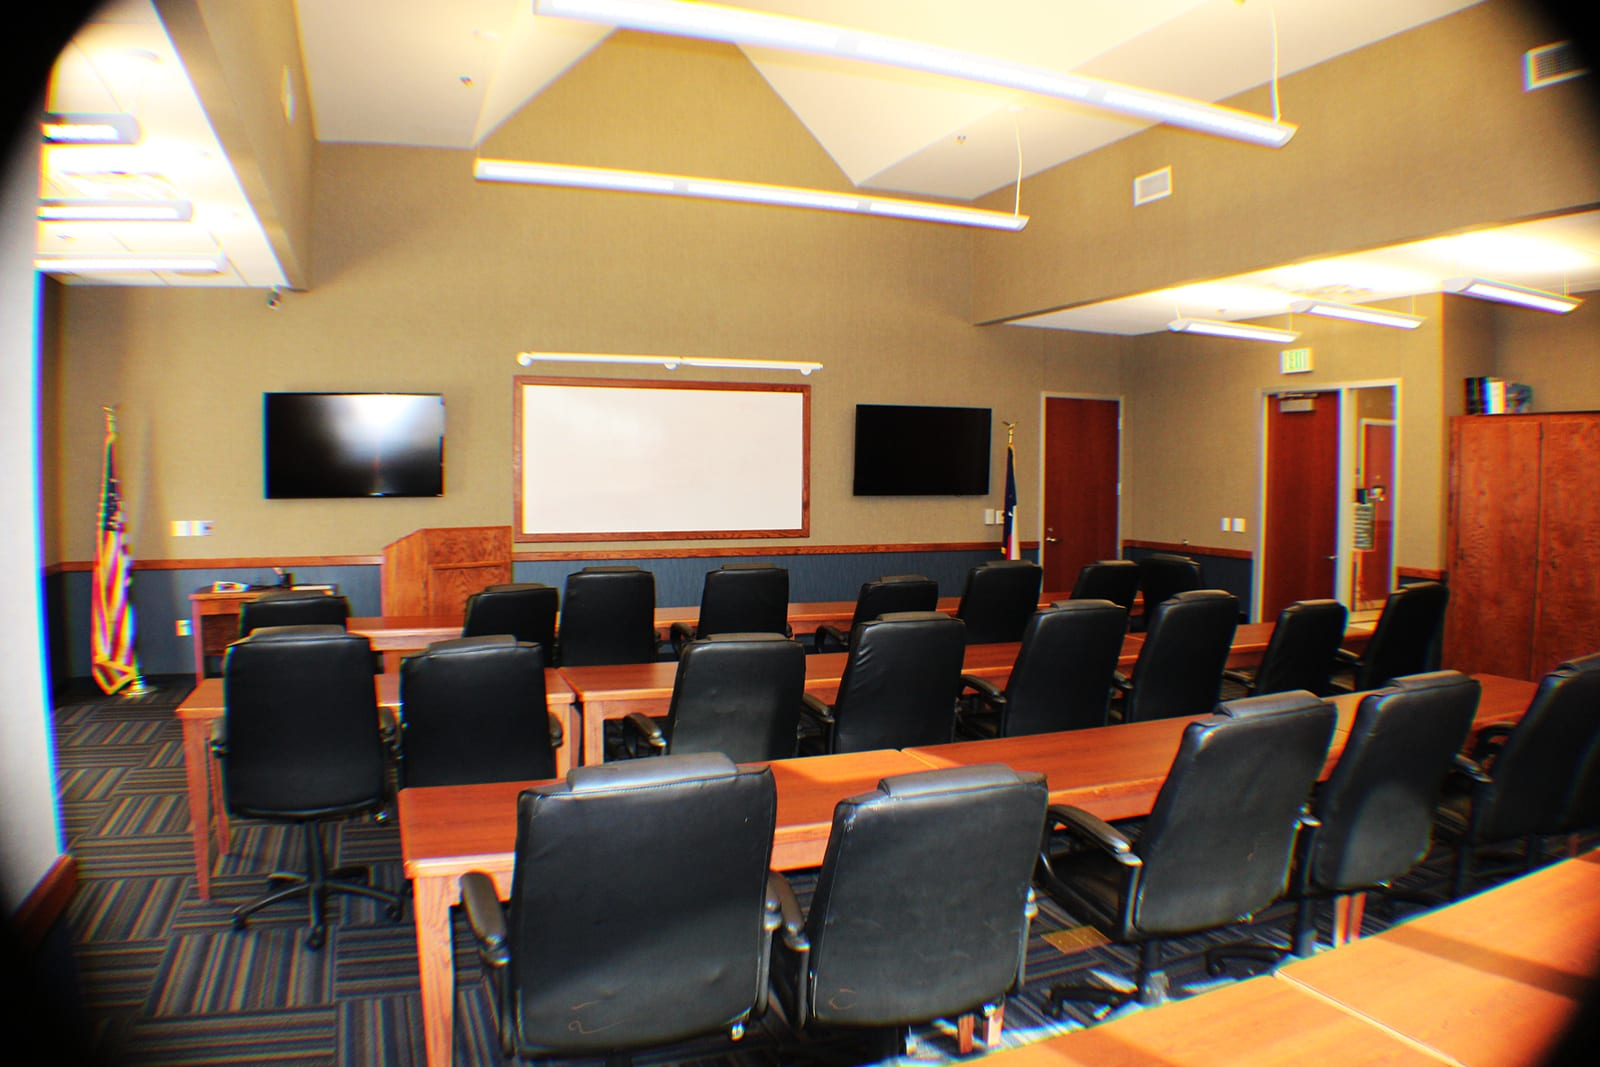 Texas Fire Academy Training classroom